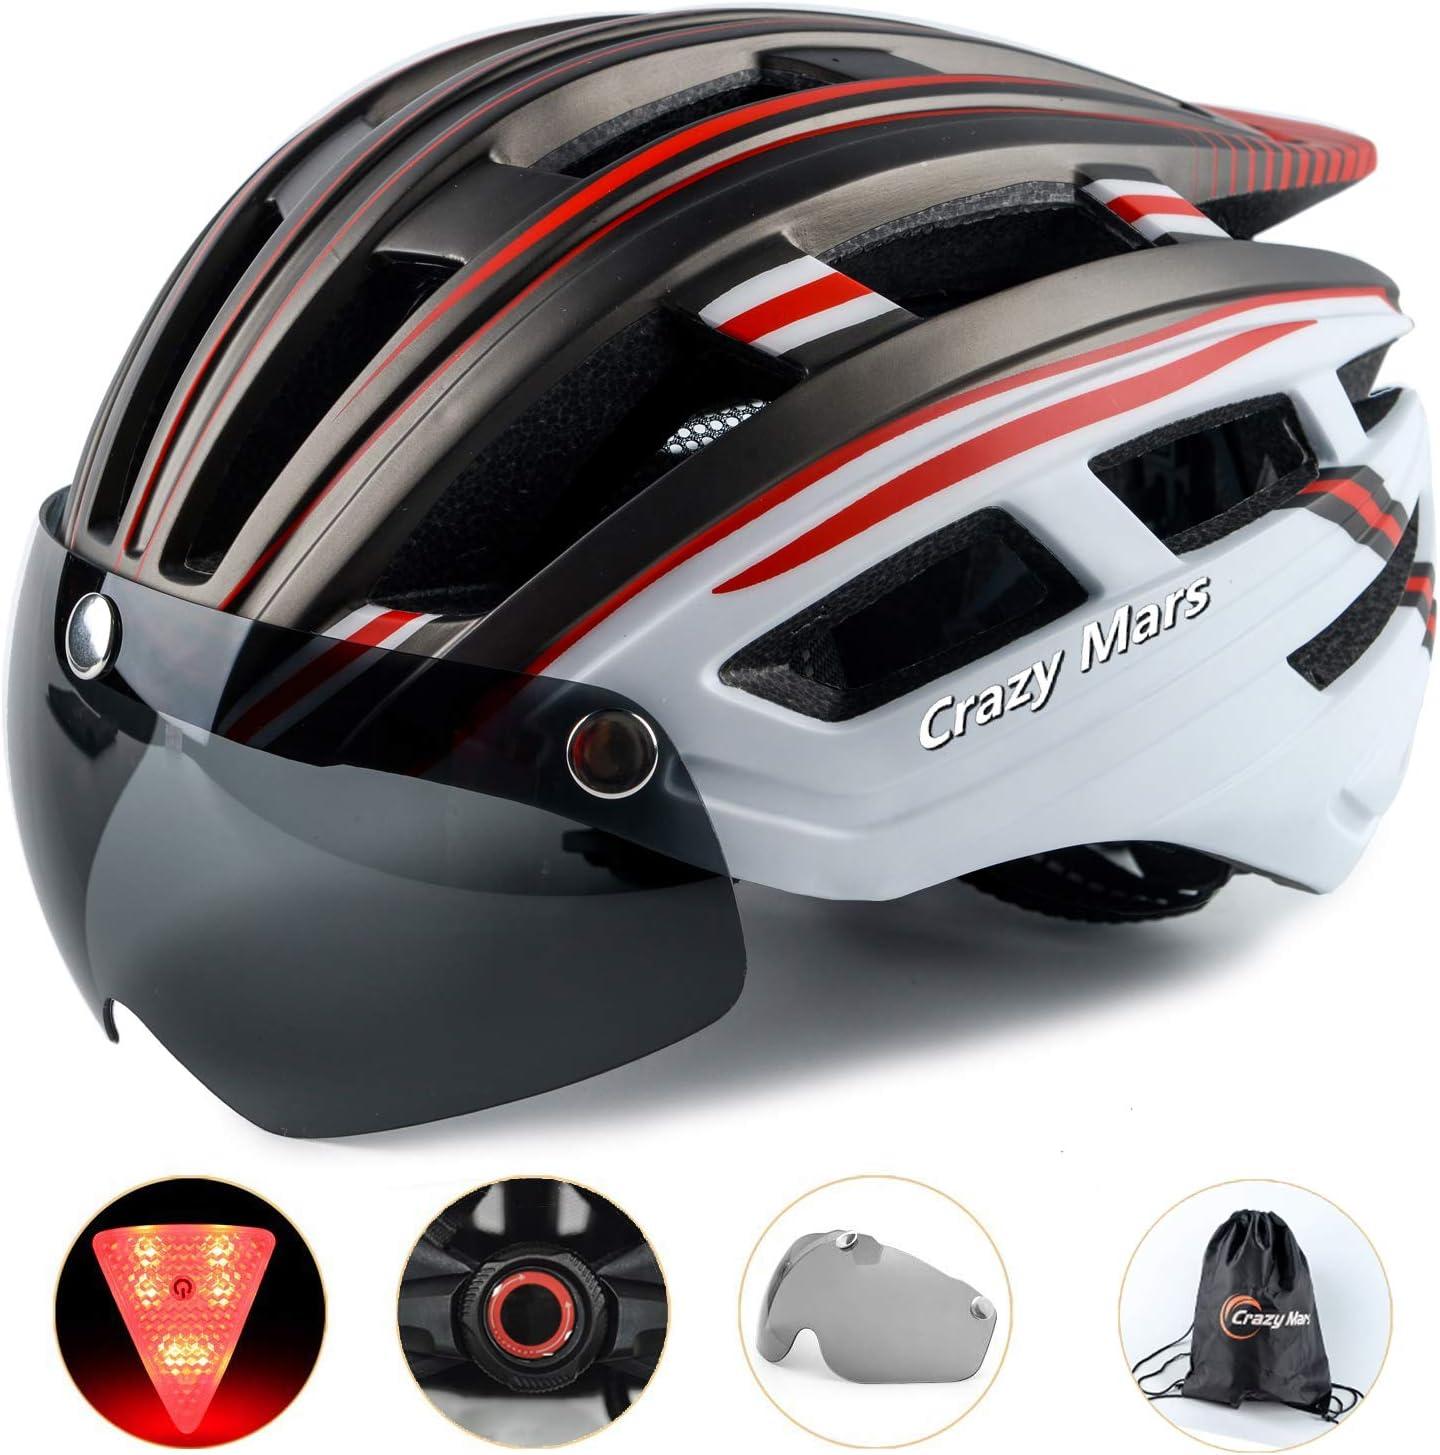 Crazy Mars Bike Bicycle Helmet – Cycling MTB BMX Helmet with Light and Magnatic Goggle Visor Men Women Adjustable